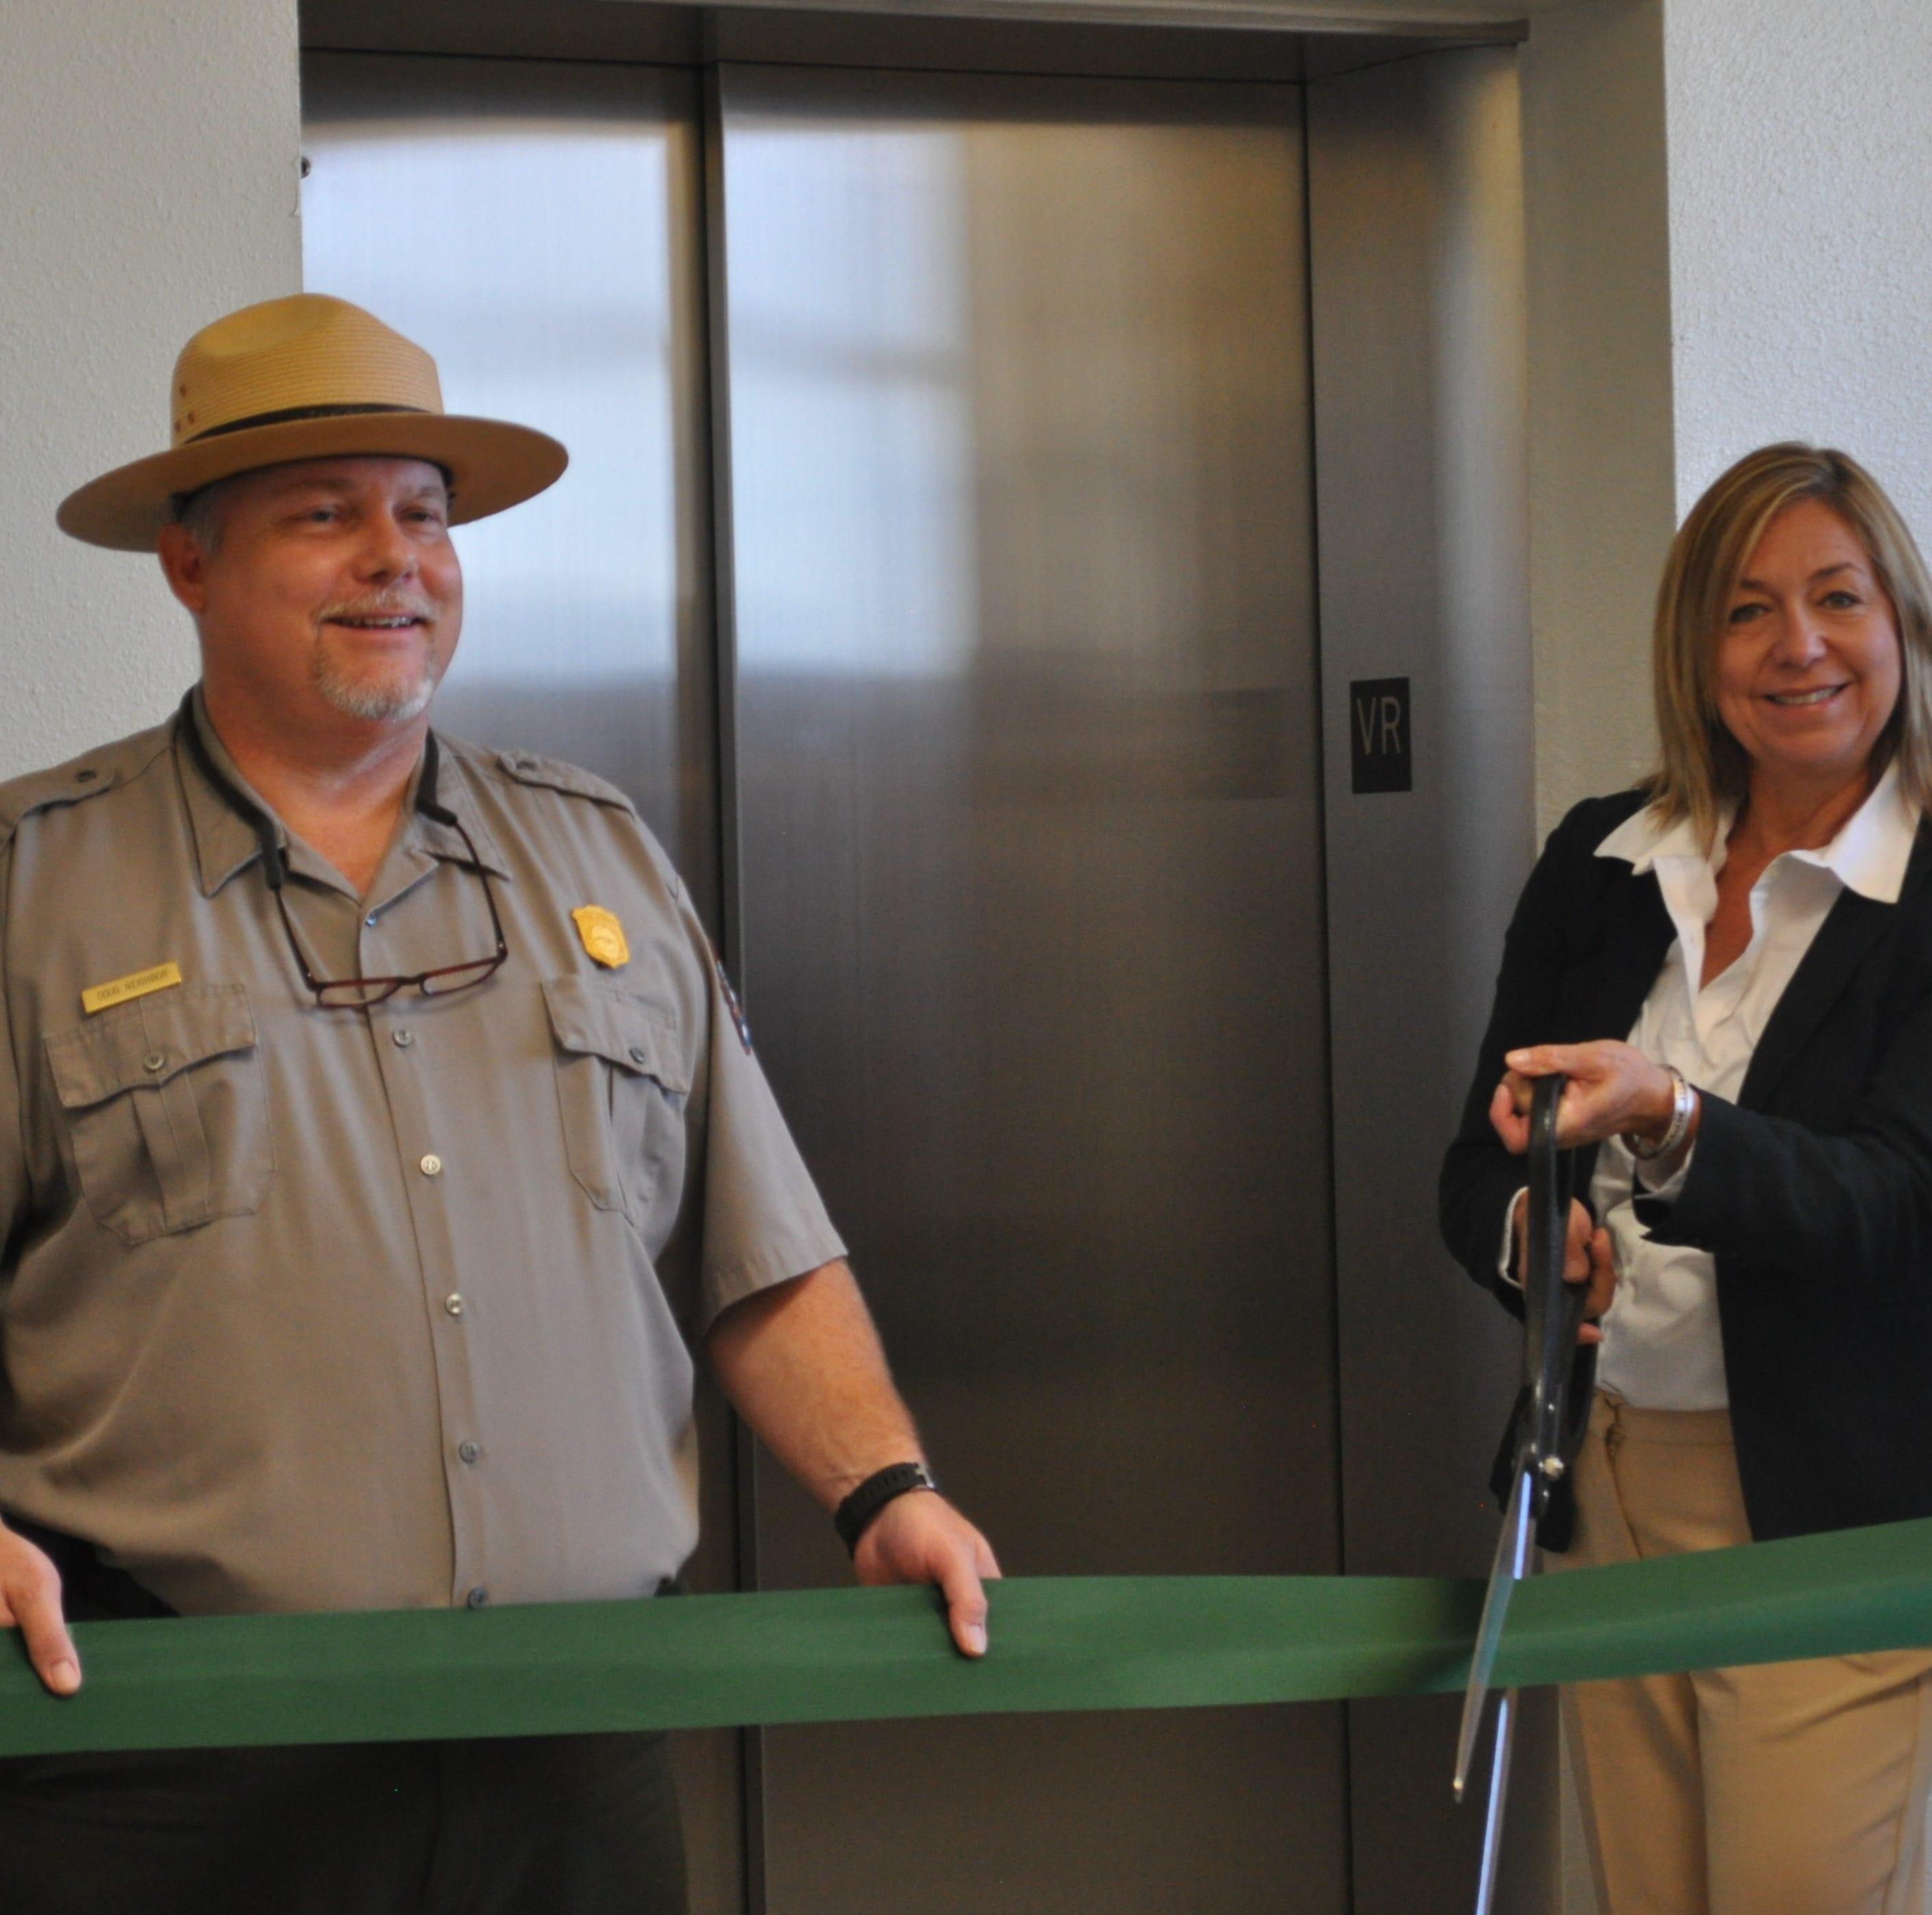 NPS celebrates completion of Carlsbad Caverns elevator project